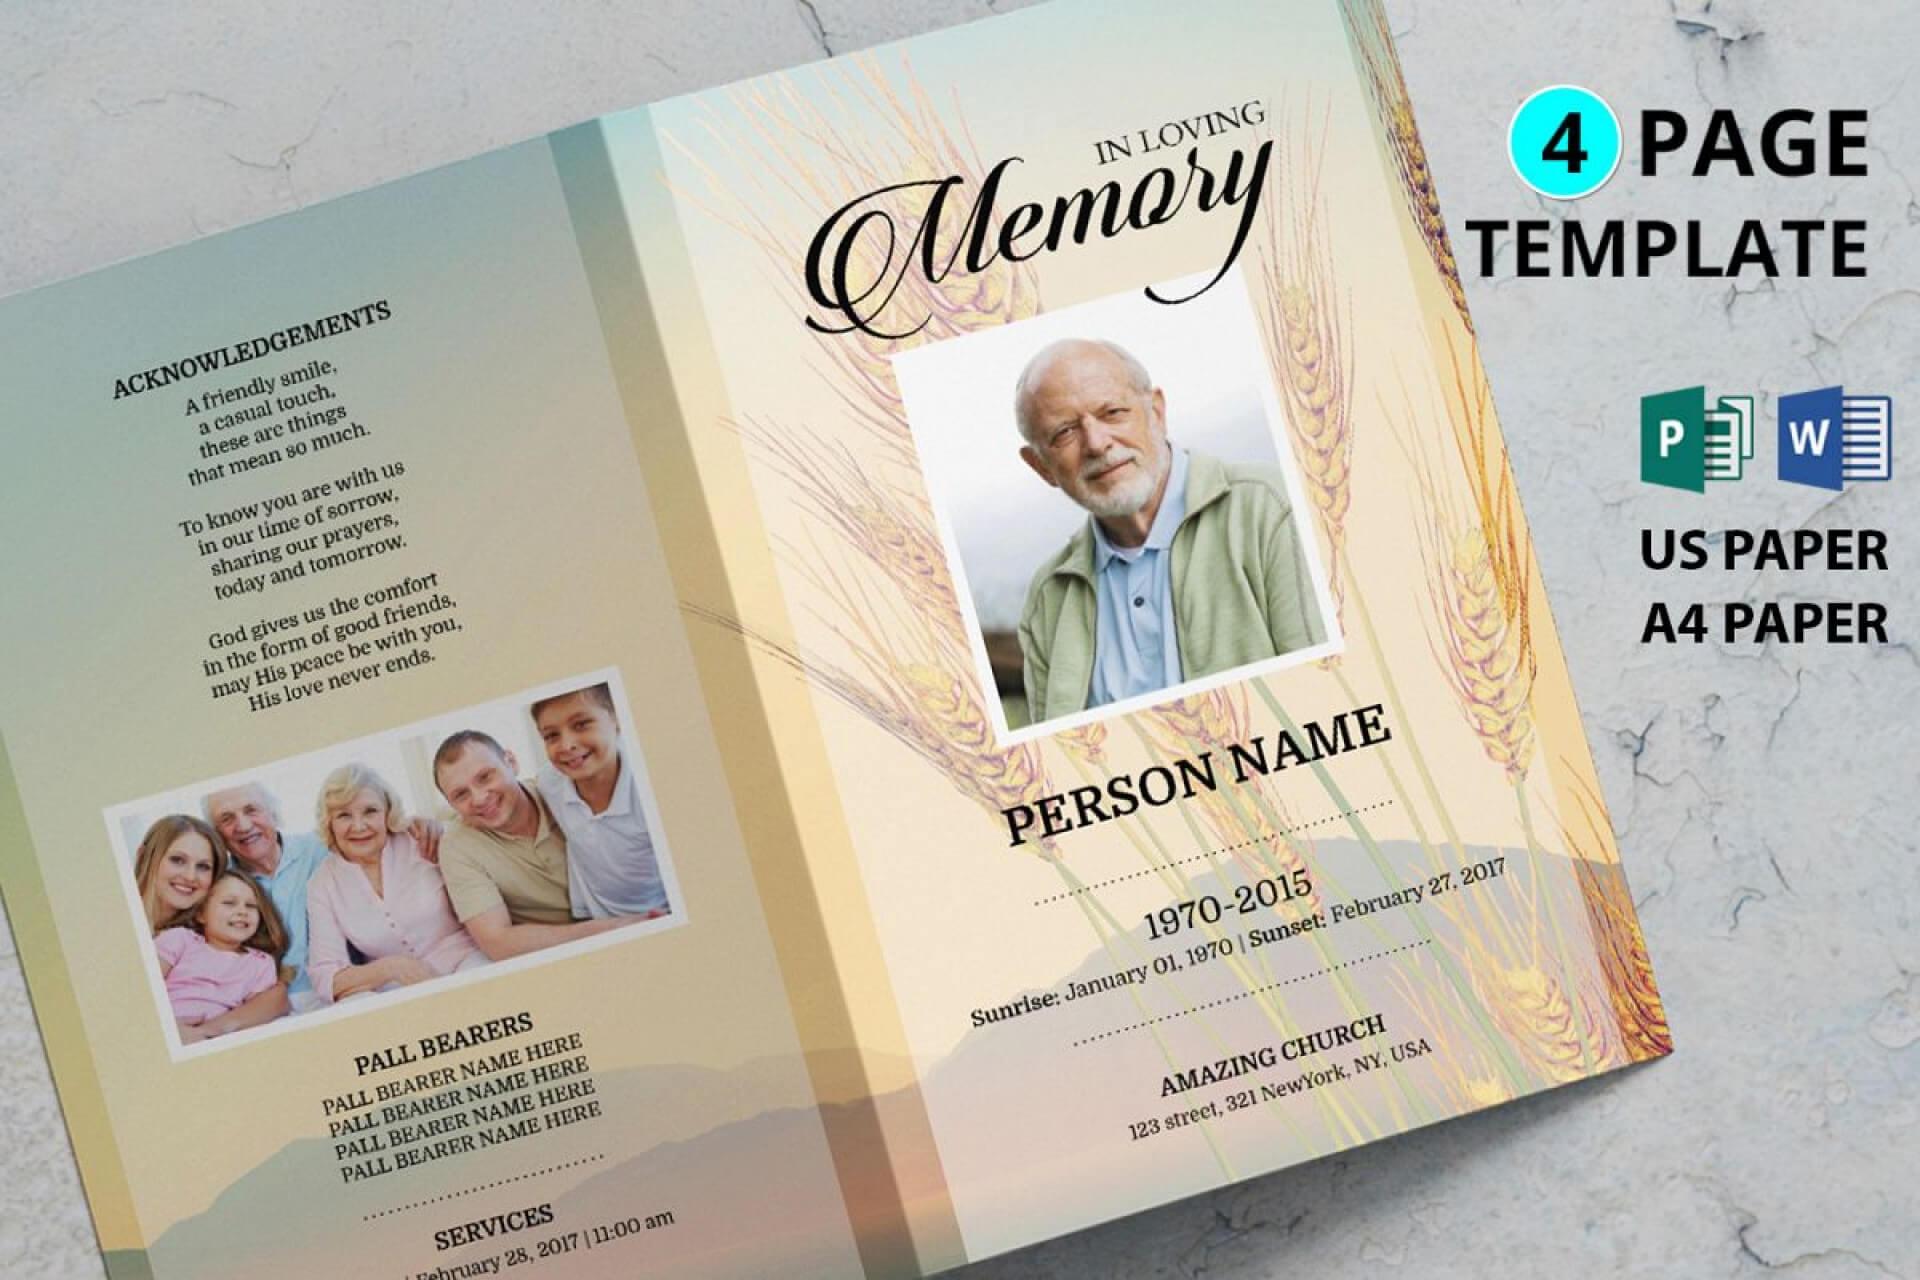 Funeral Brochure Template Word - C Punkt Regarding Memorial Brochure Template